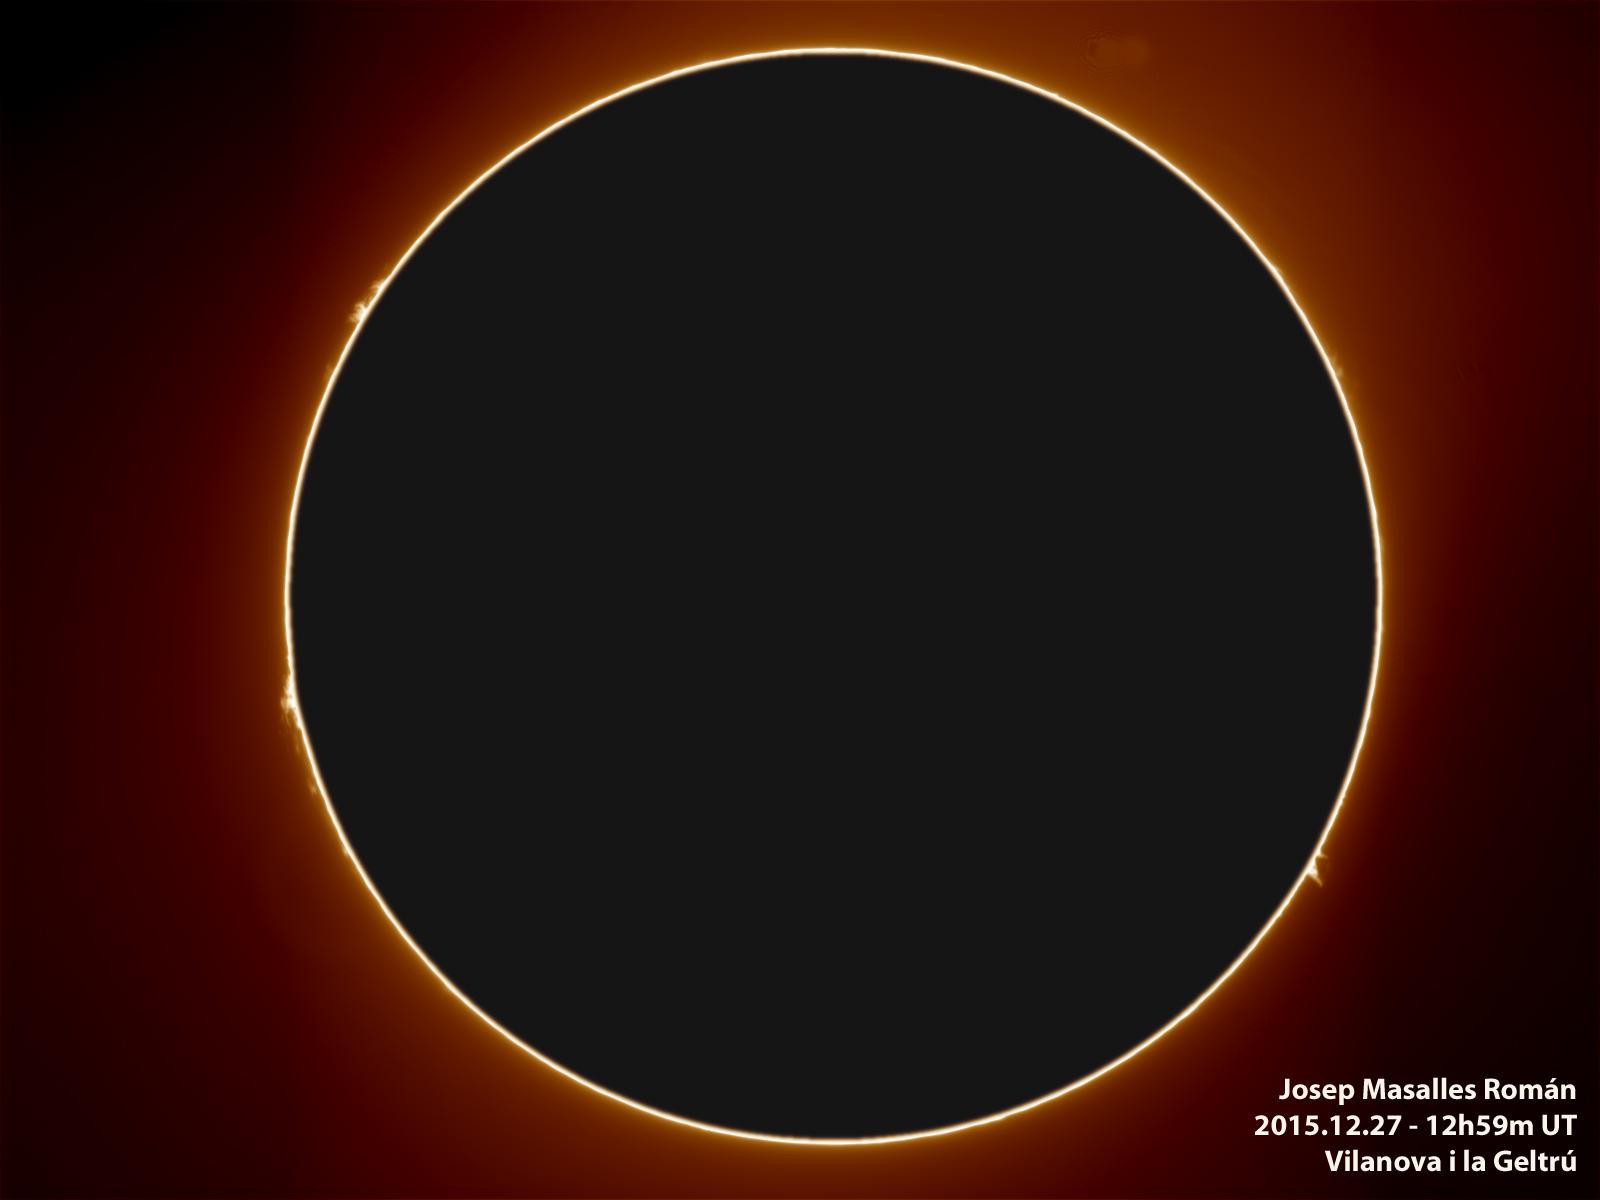 20151227-Sol-H-Alfa-12h59-rc